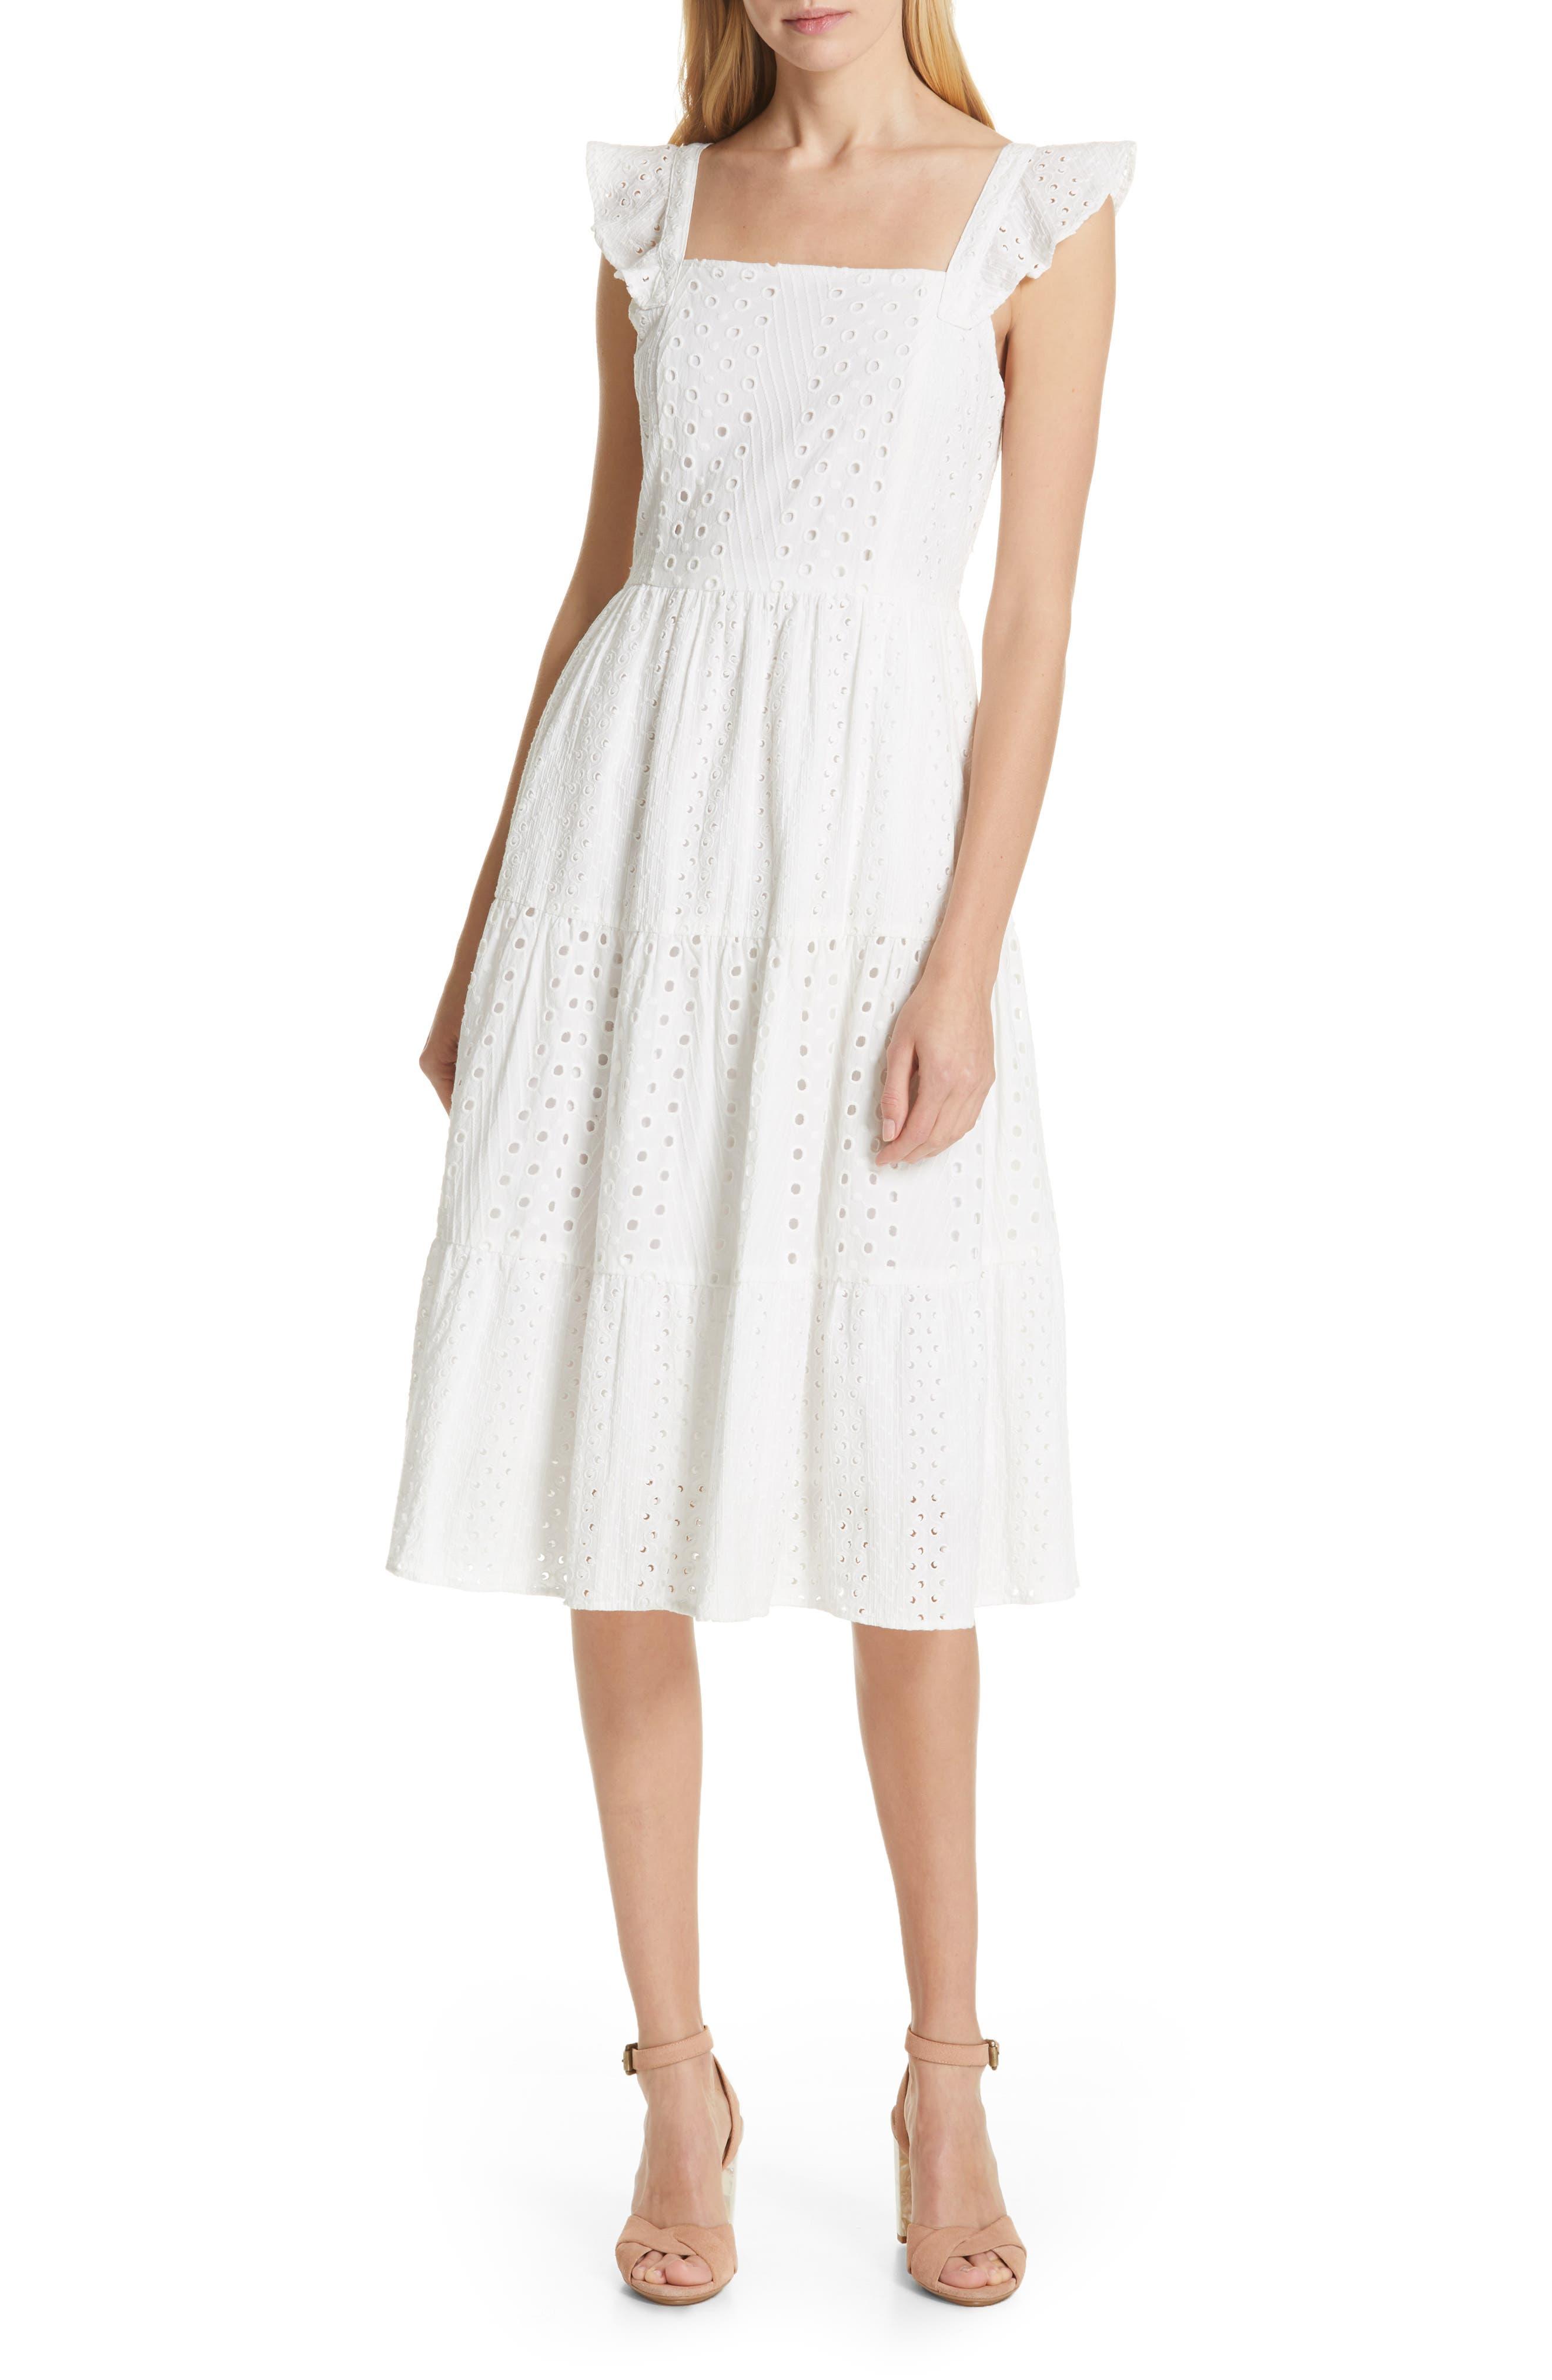 Dolan Emmylou Tiered Eyelet Midi Sundress, White